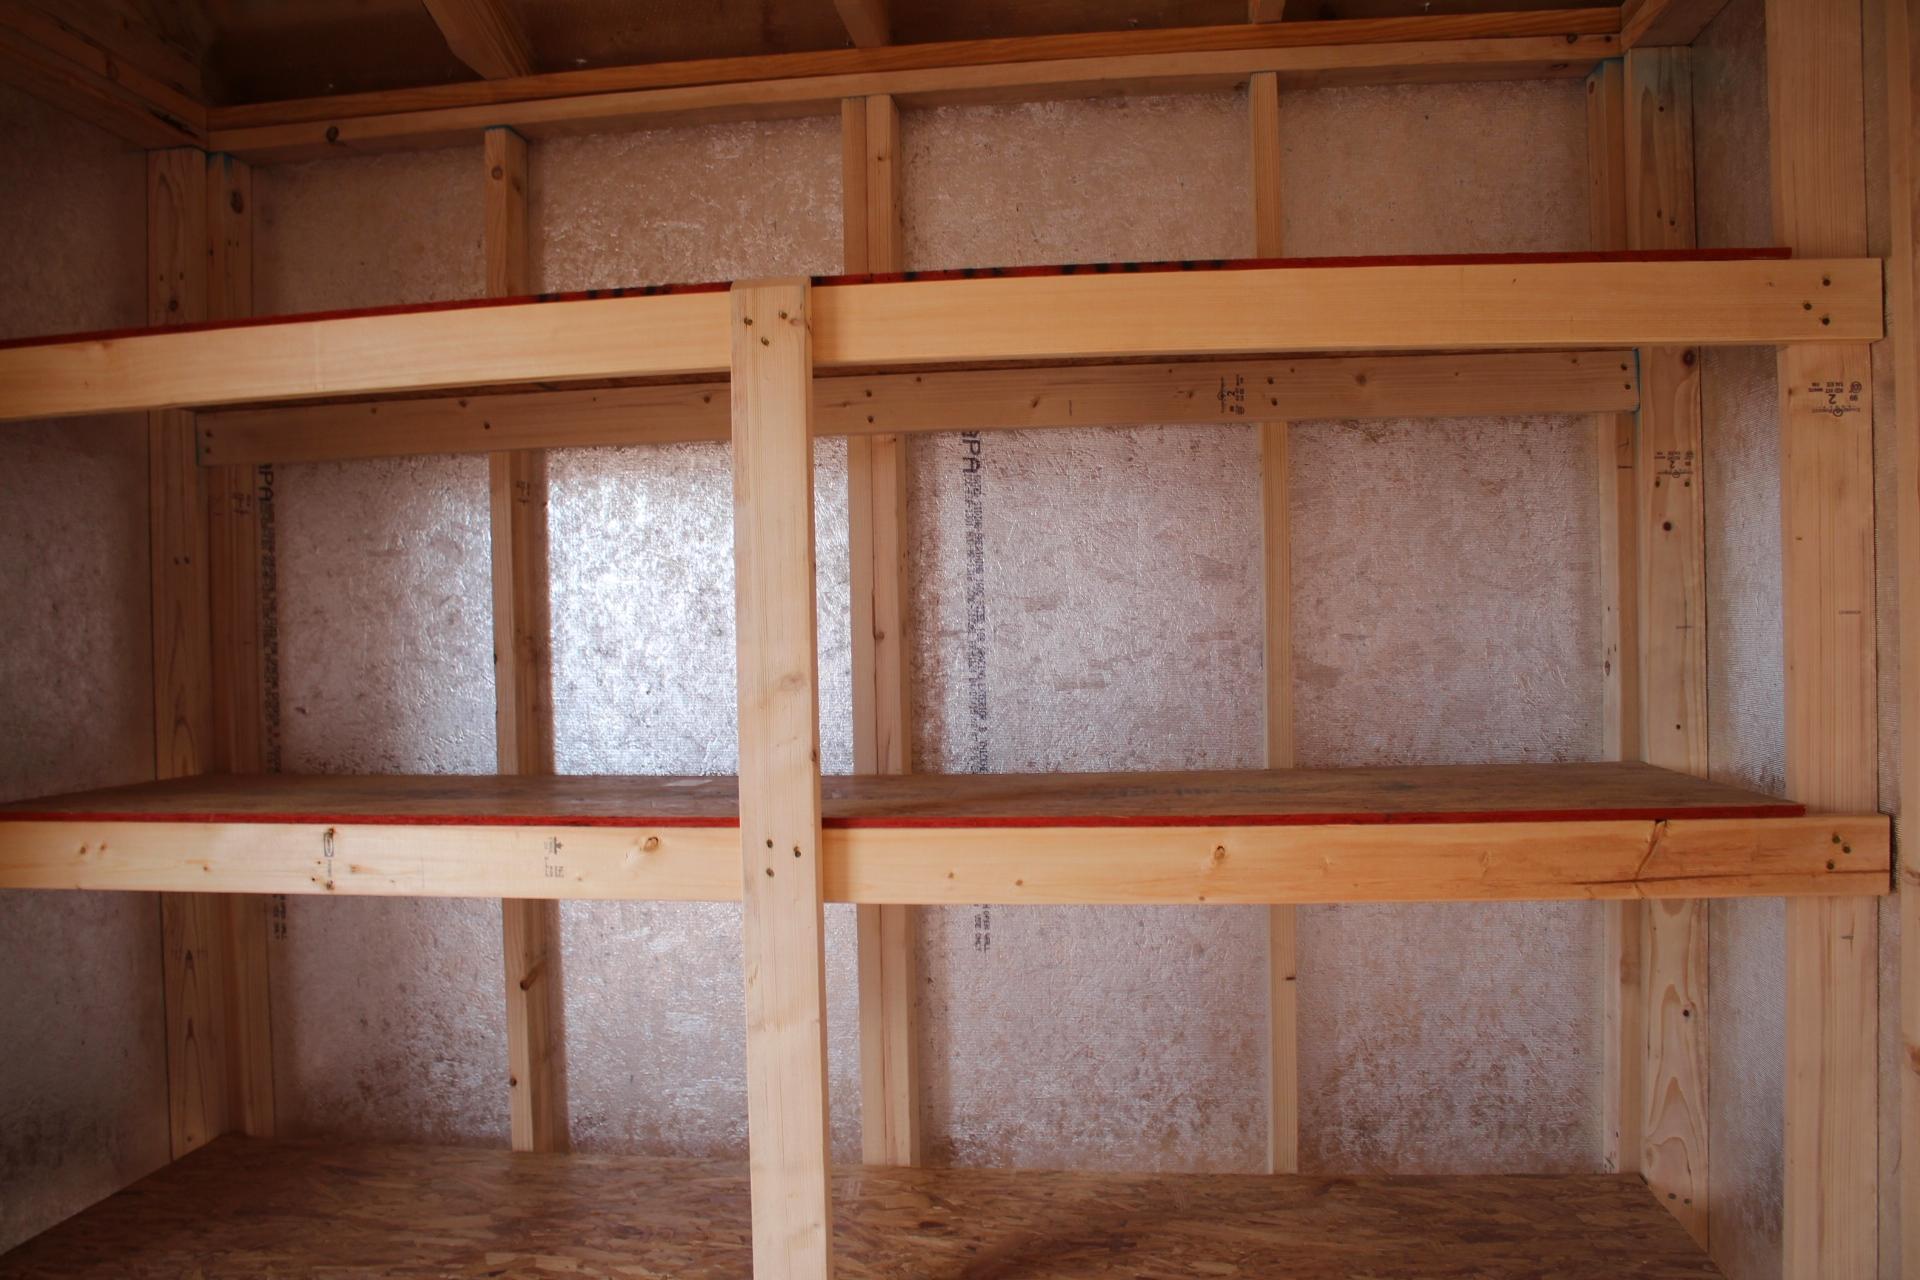 Shelves and Silvertech Walls